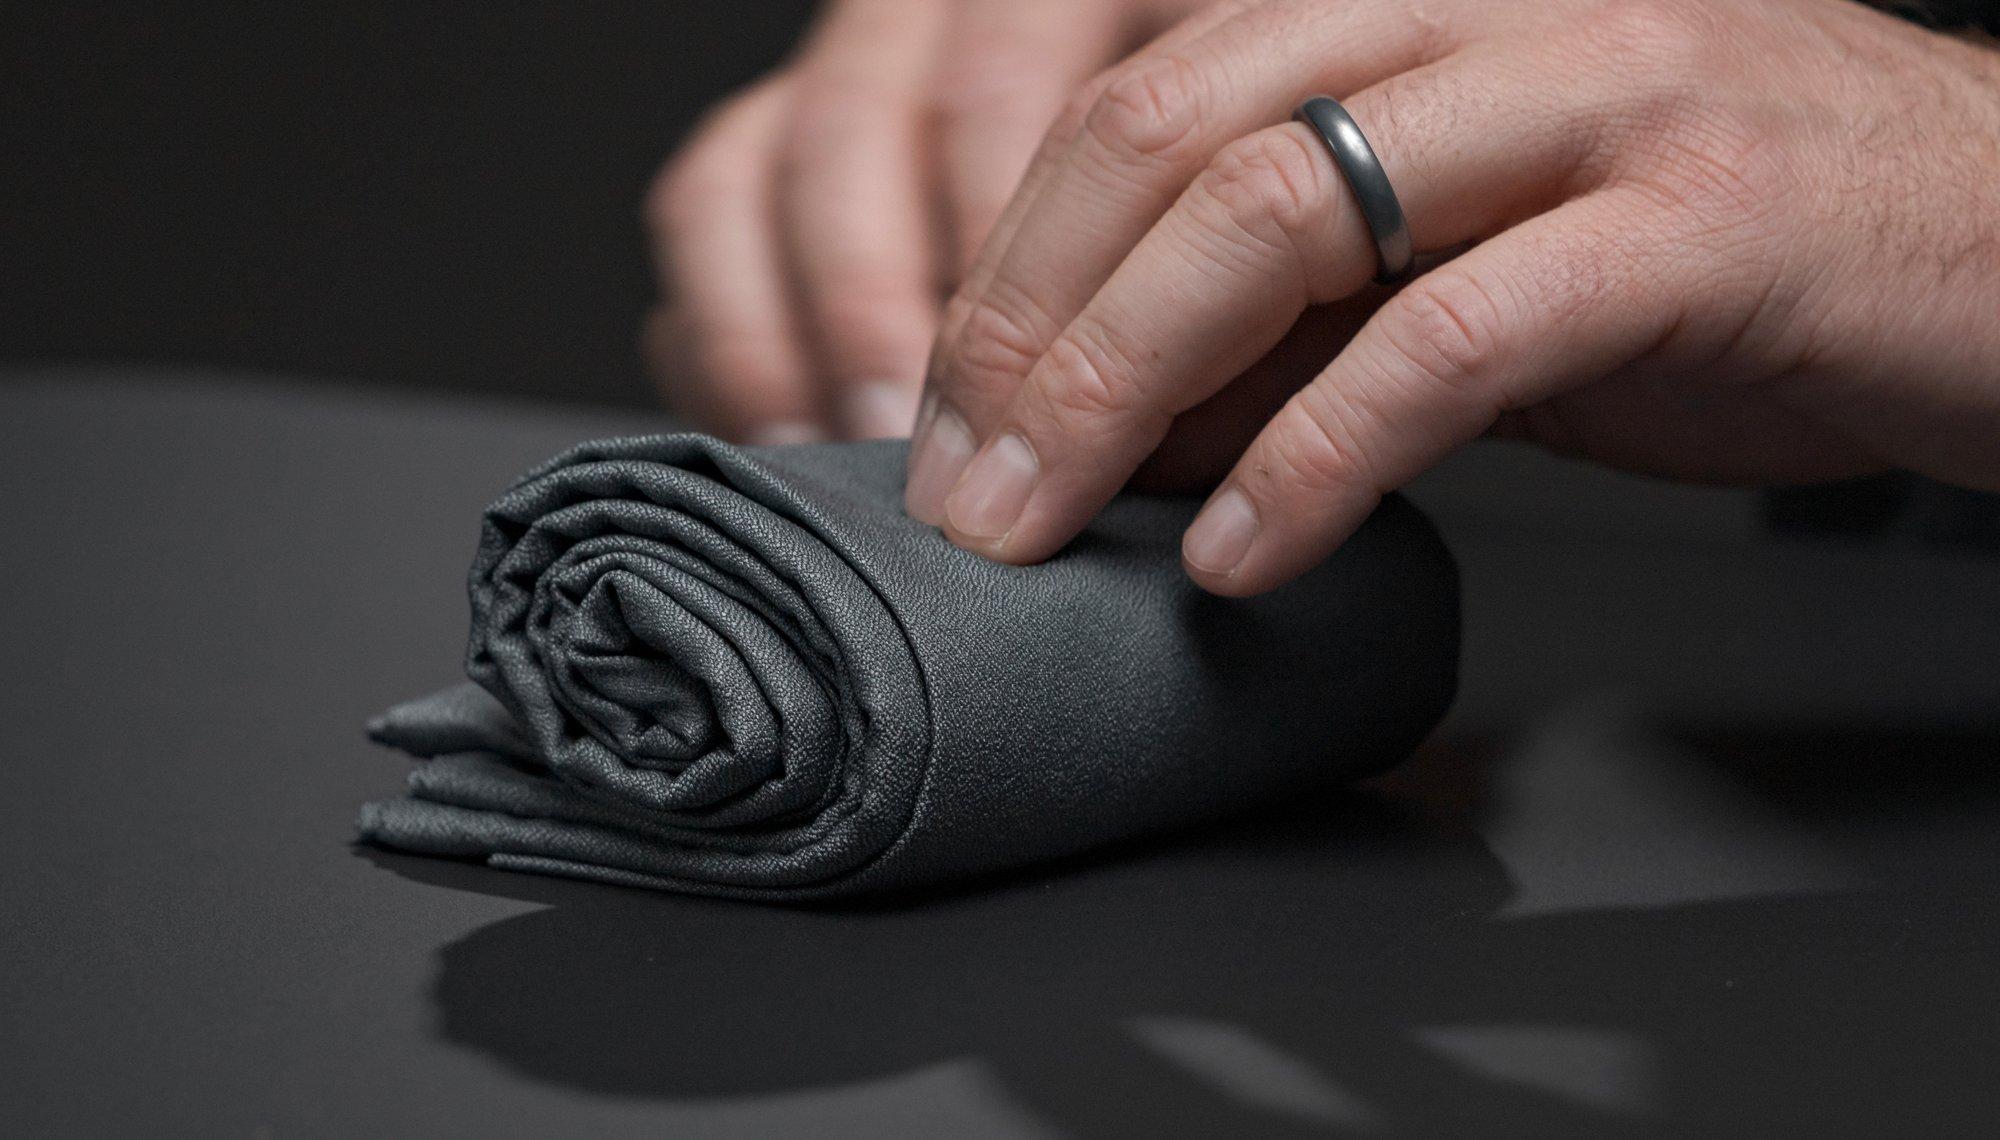 ultralighttraveltowellarge-weblayout-0003-matador-ul-towels-02.jpeg